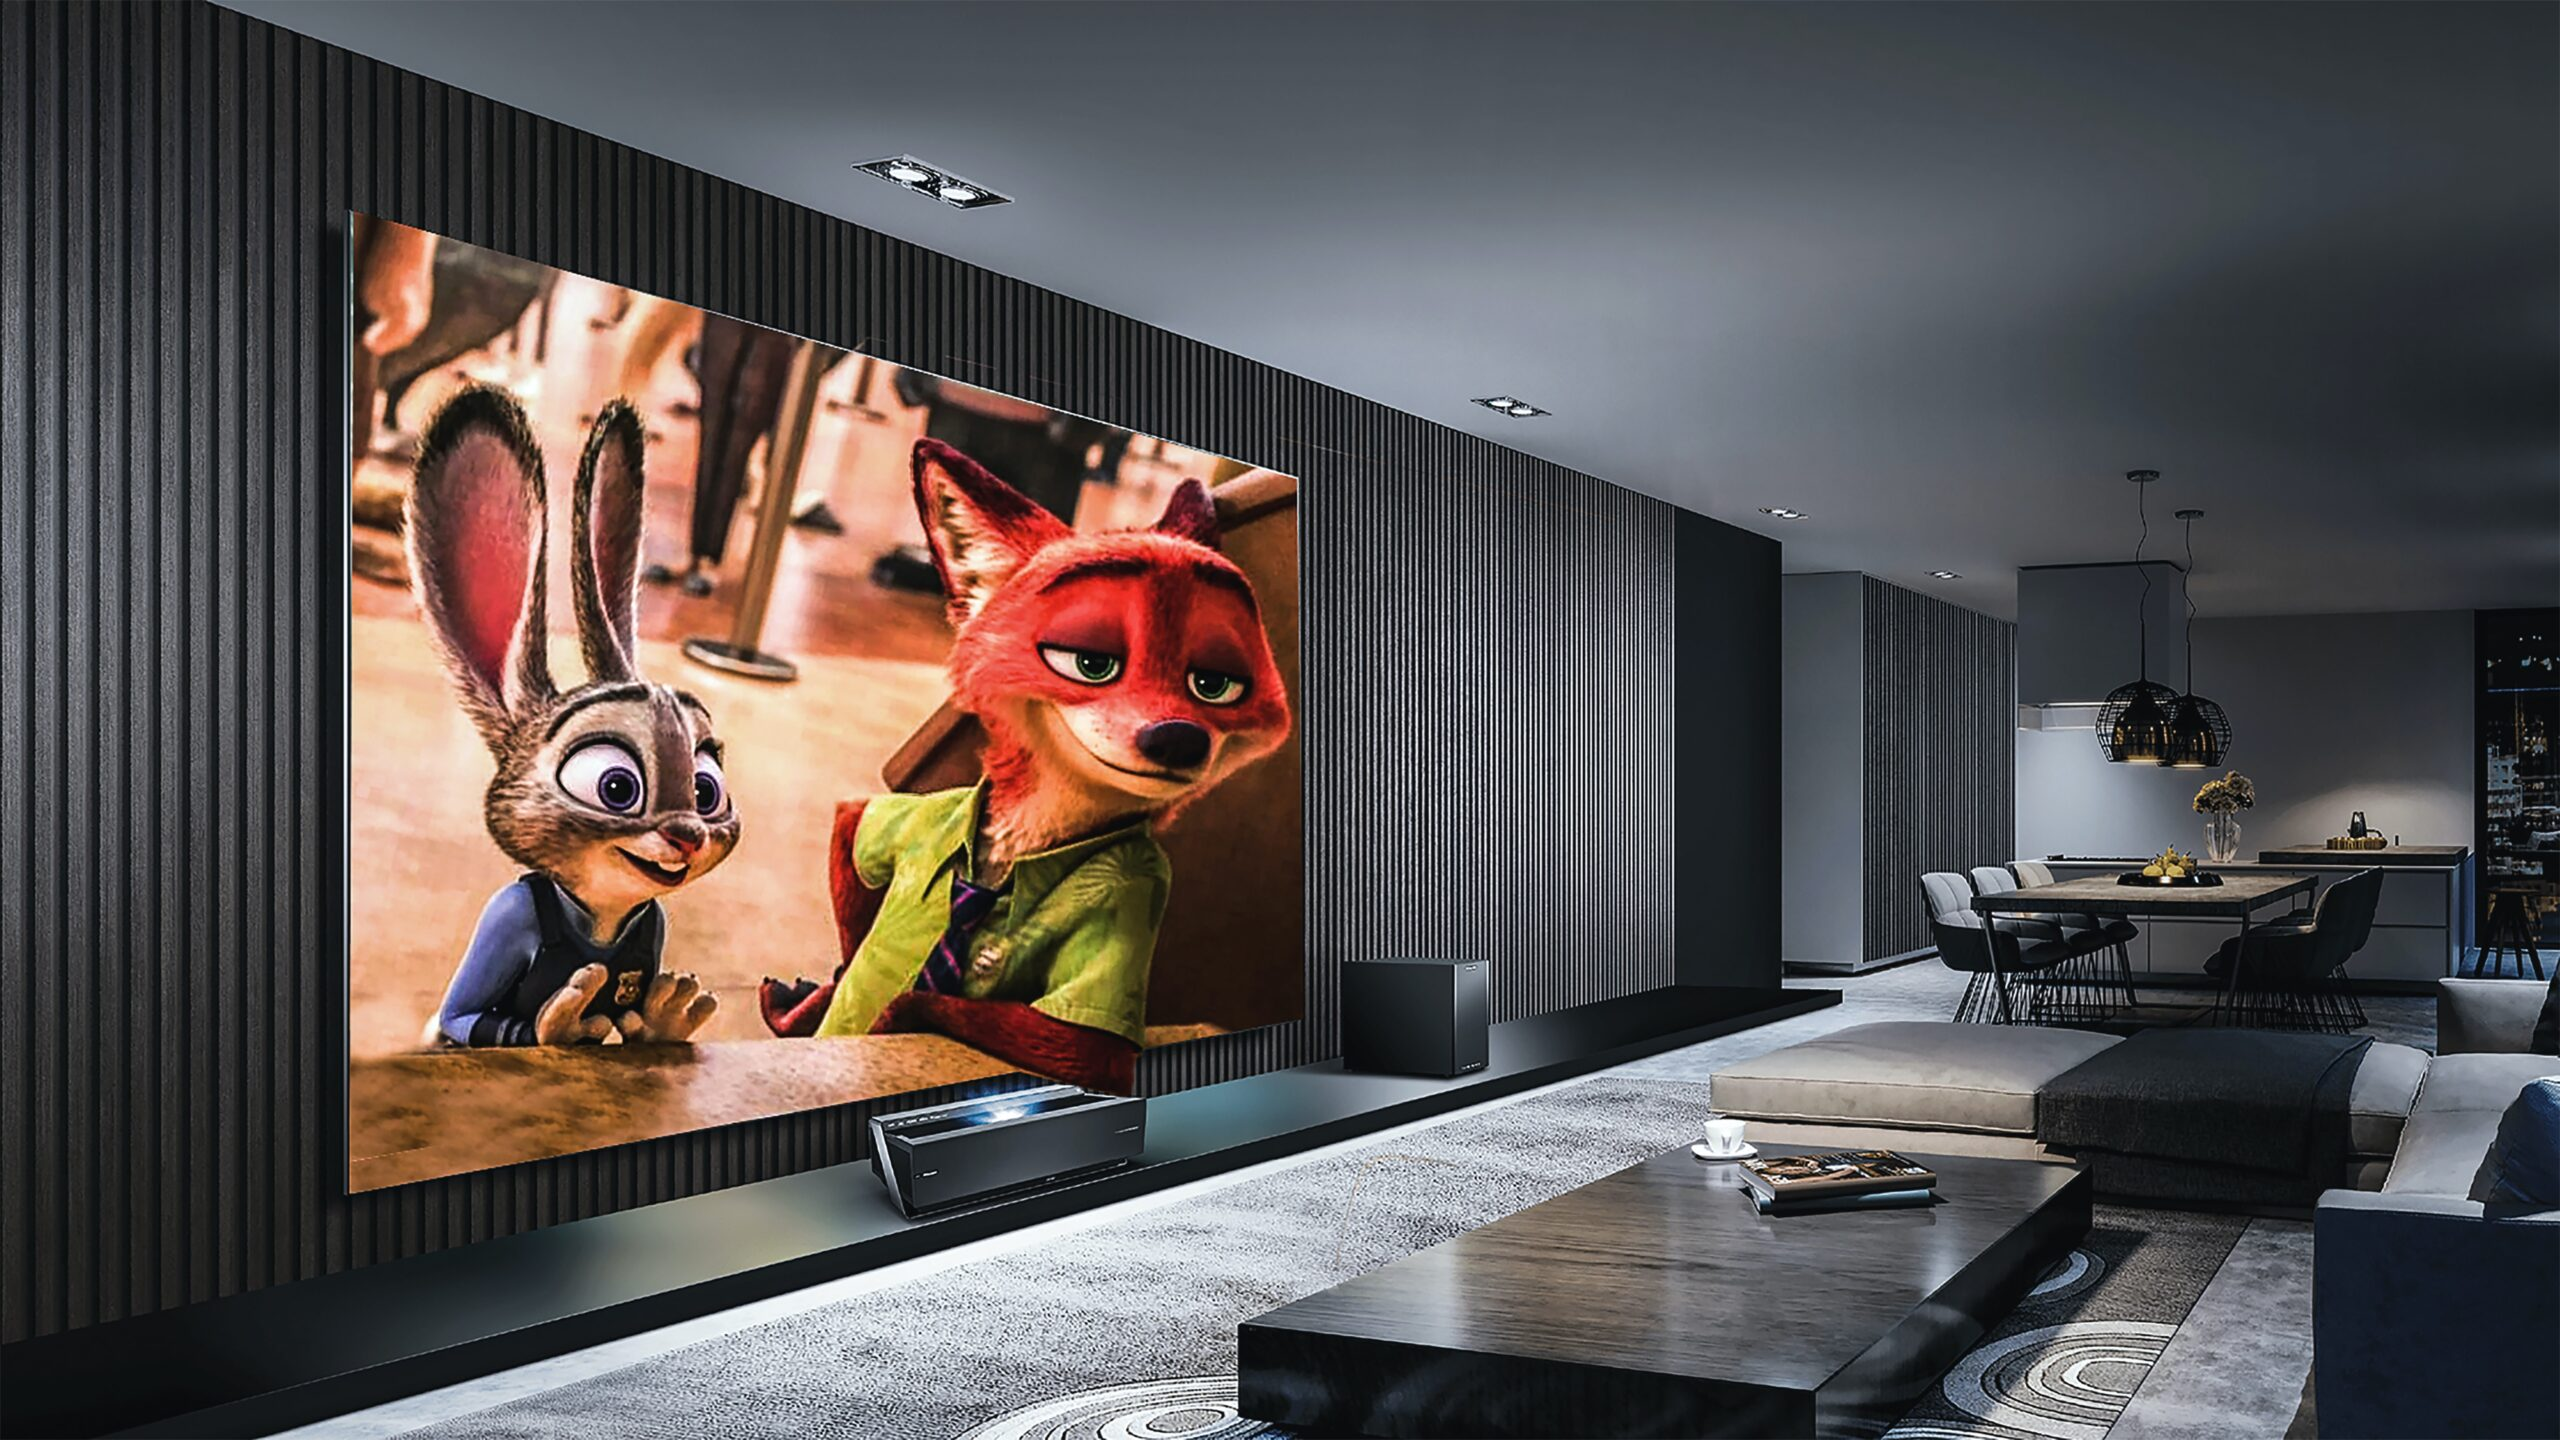 chauhan-moniz-Film screen large in smarthome livingroom-unsplash